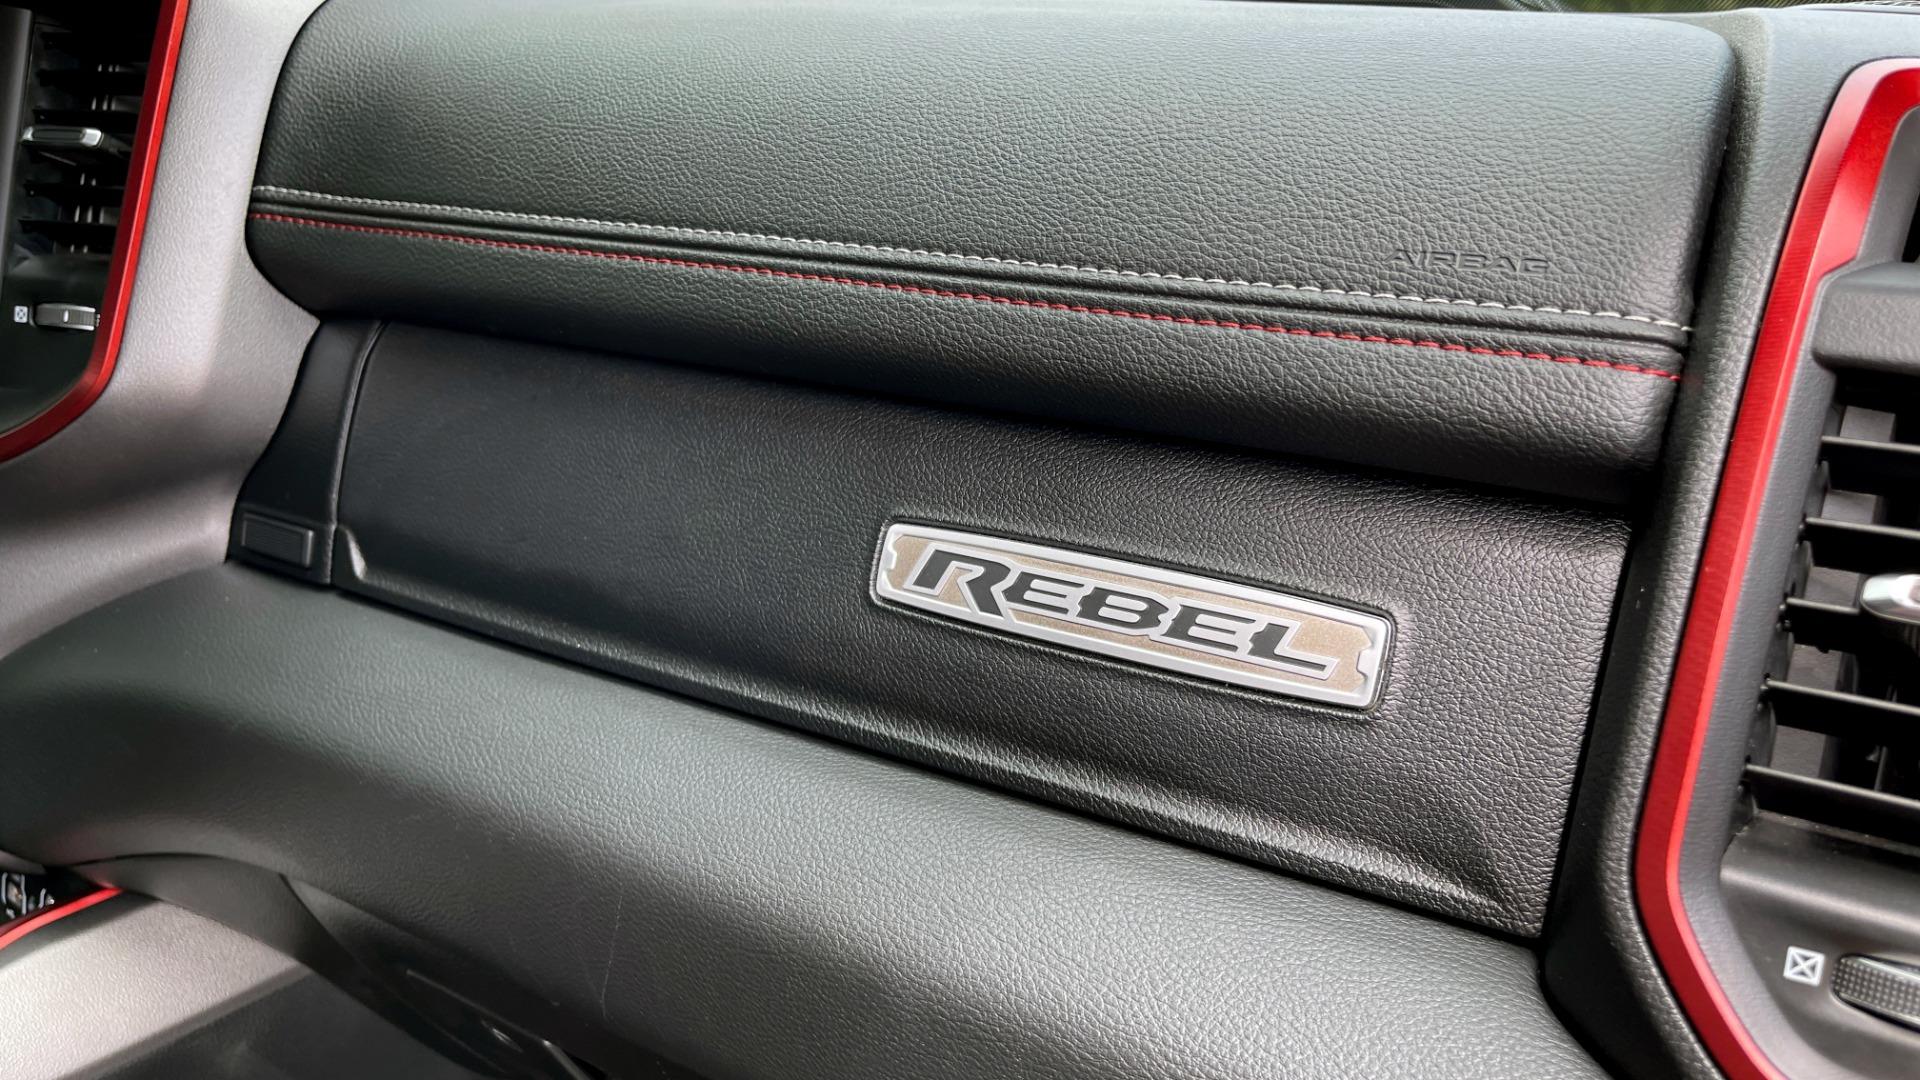 Used 2019 Ram 1500 REBEL QUADCAB 4X4 / 5.7L HEMI / 8-SPD AUTO / REMOTE START / PARK ASSIST for sale $44,495 at Formula Imports in Charlotte NC 28227 68